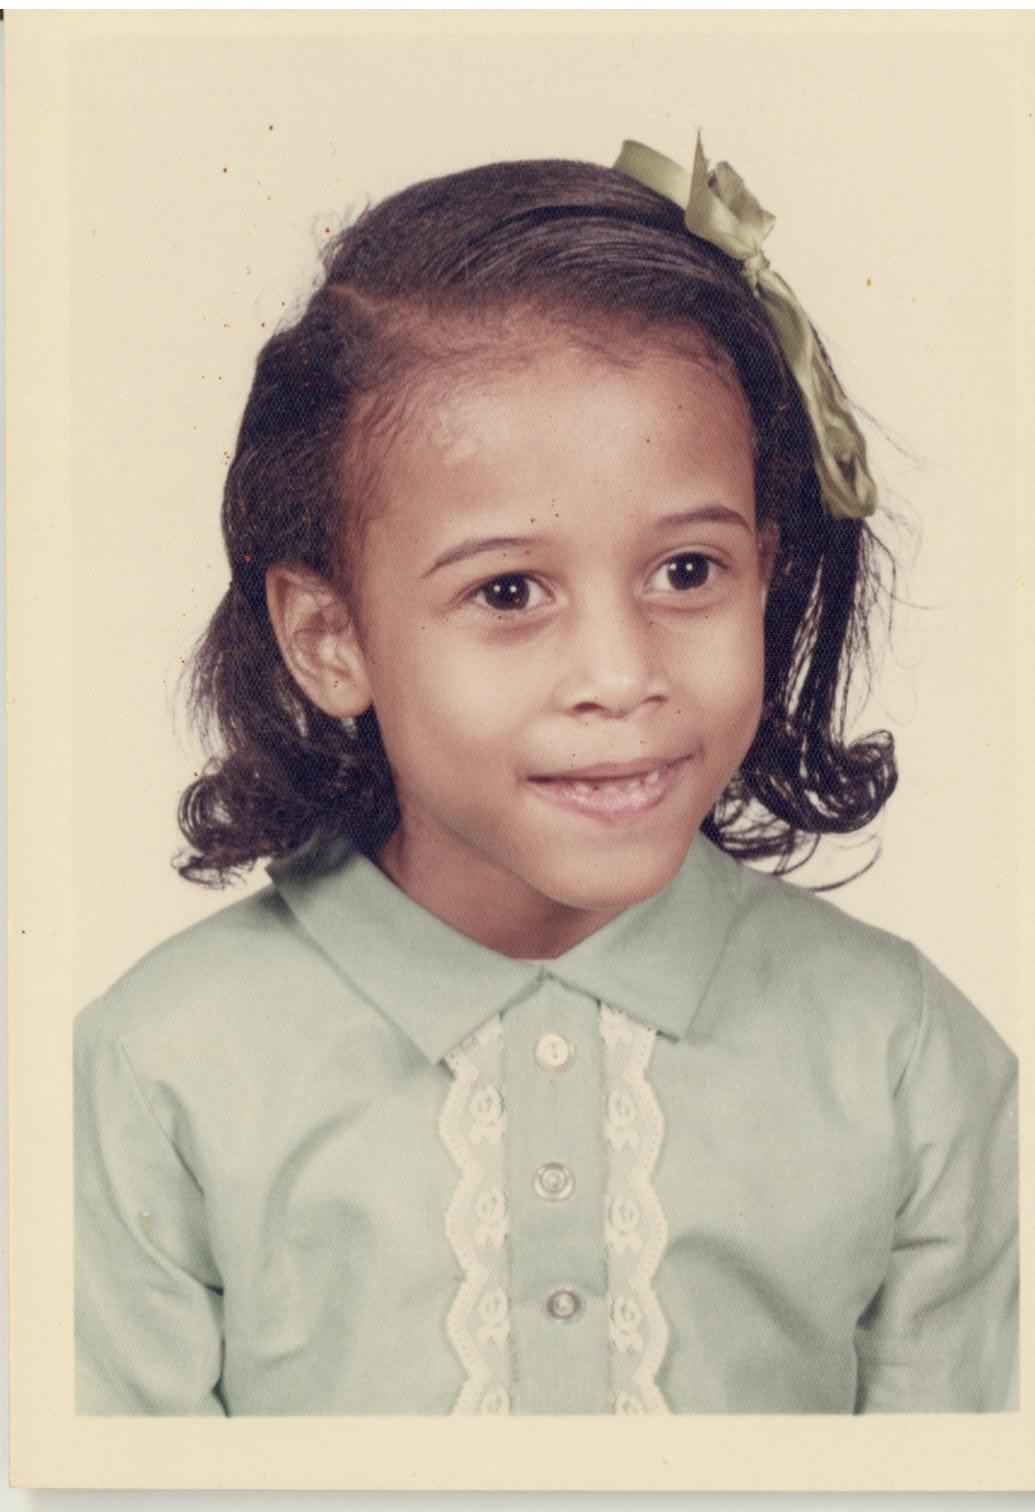 Michelle_as_a_girl.JPG